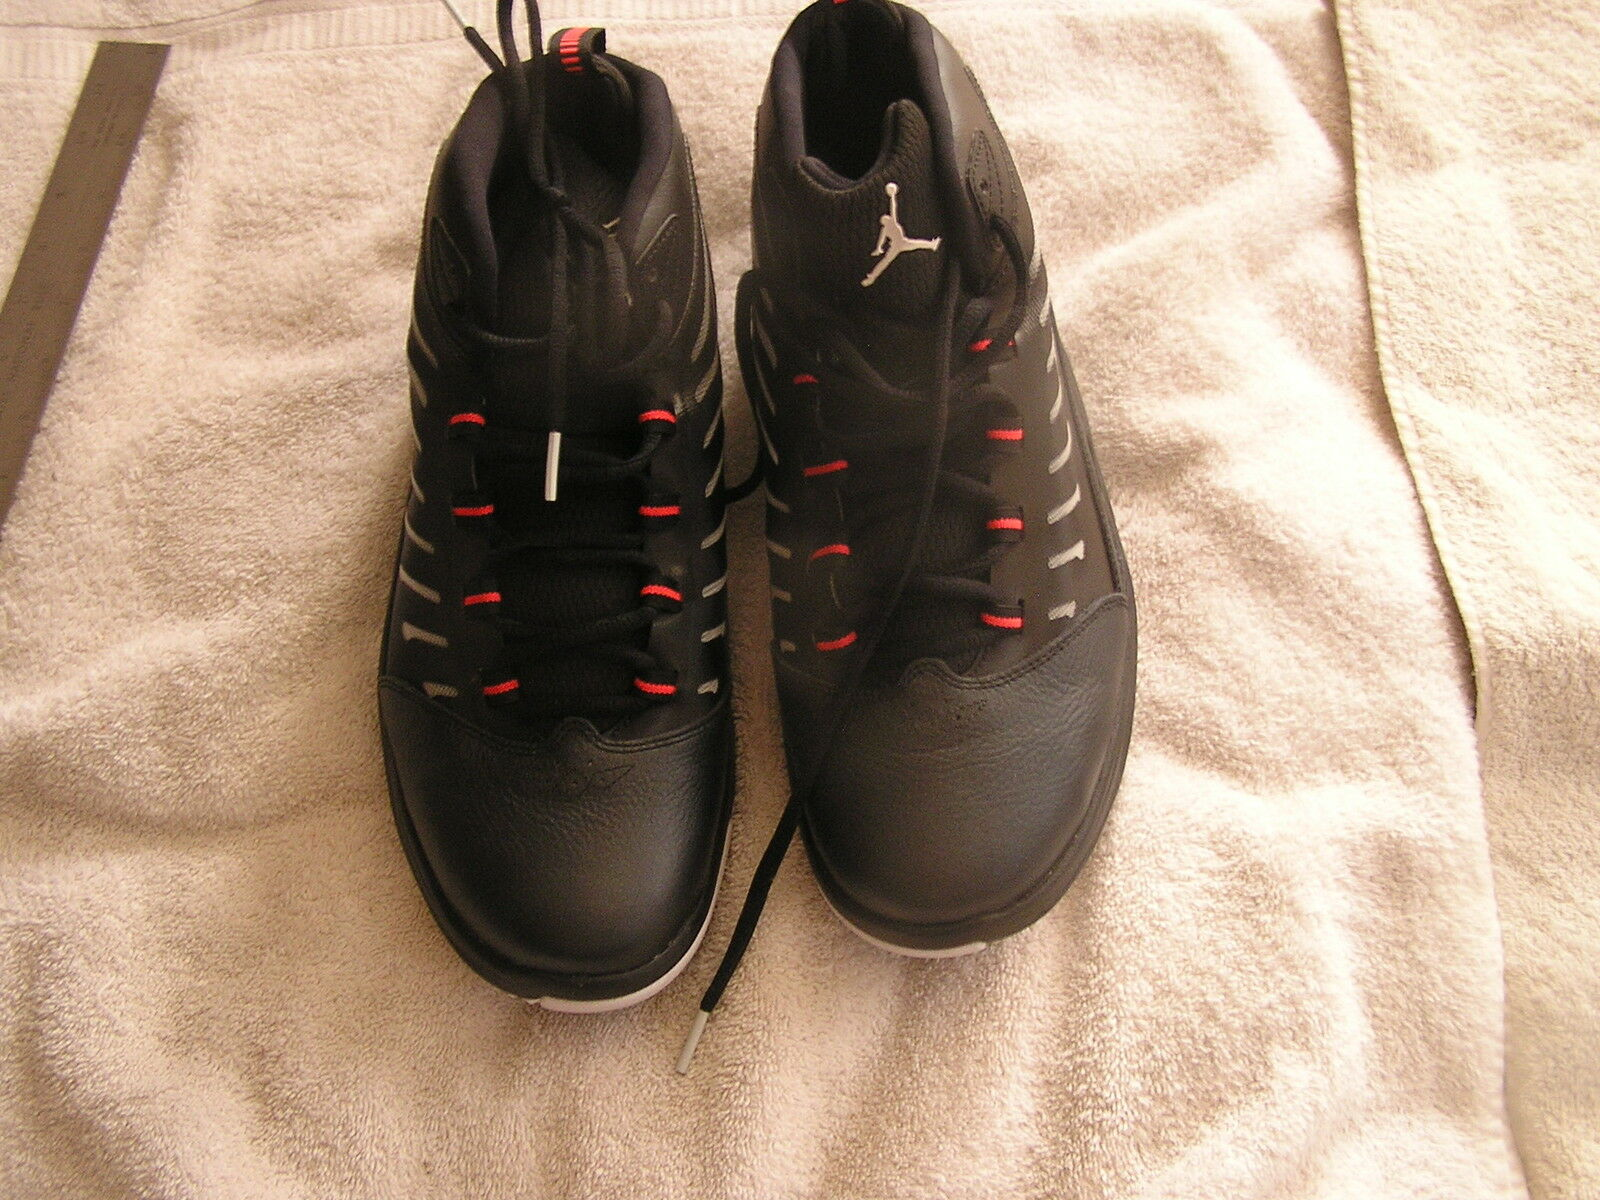 Nike Air Jordon Size 12.5  2014